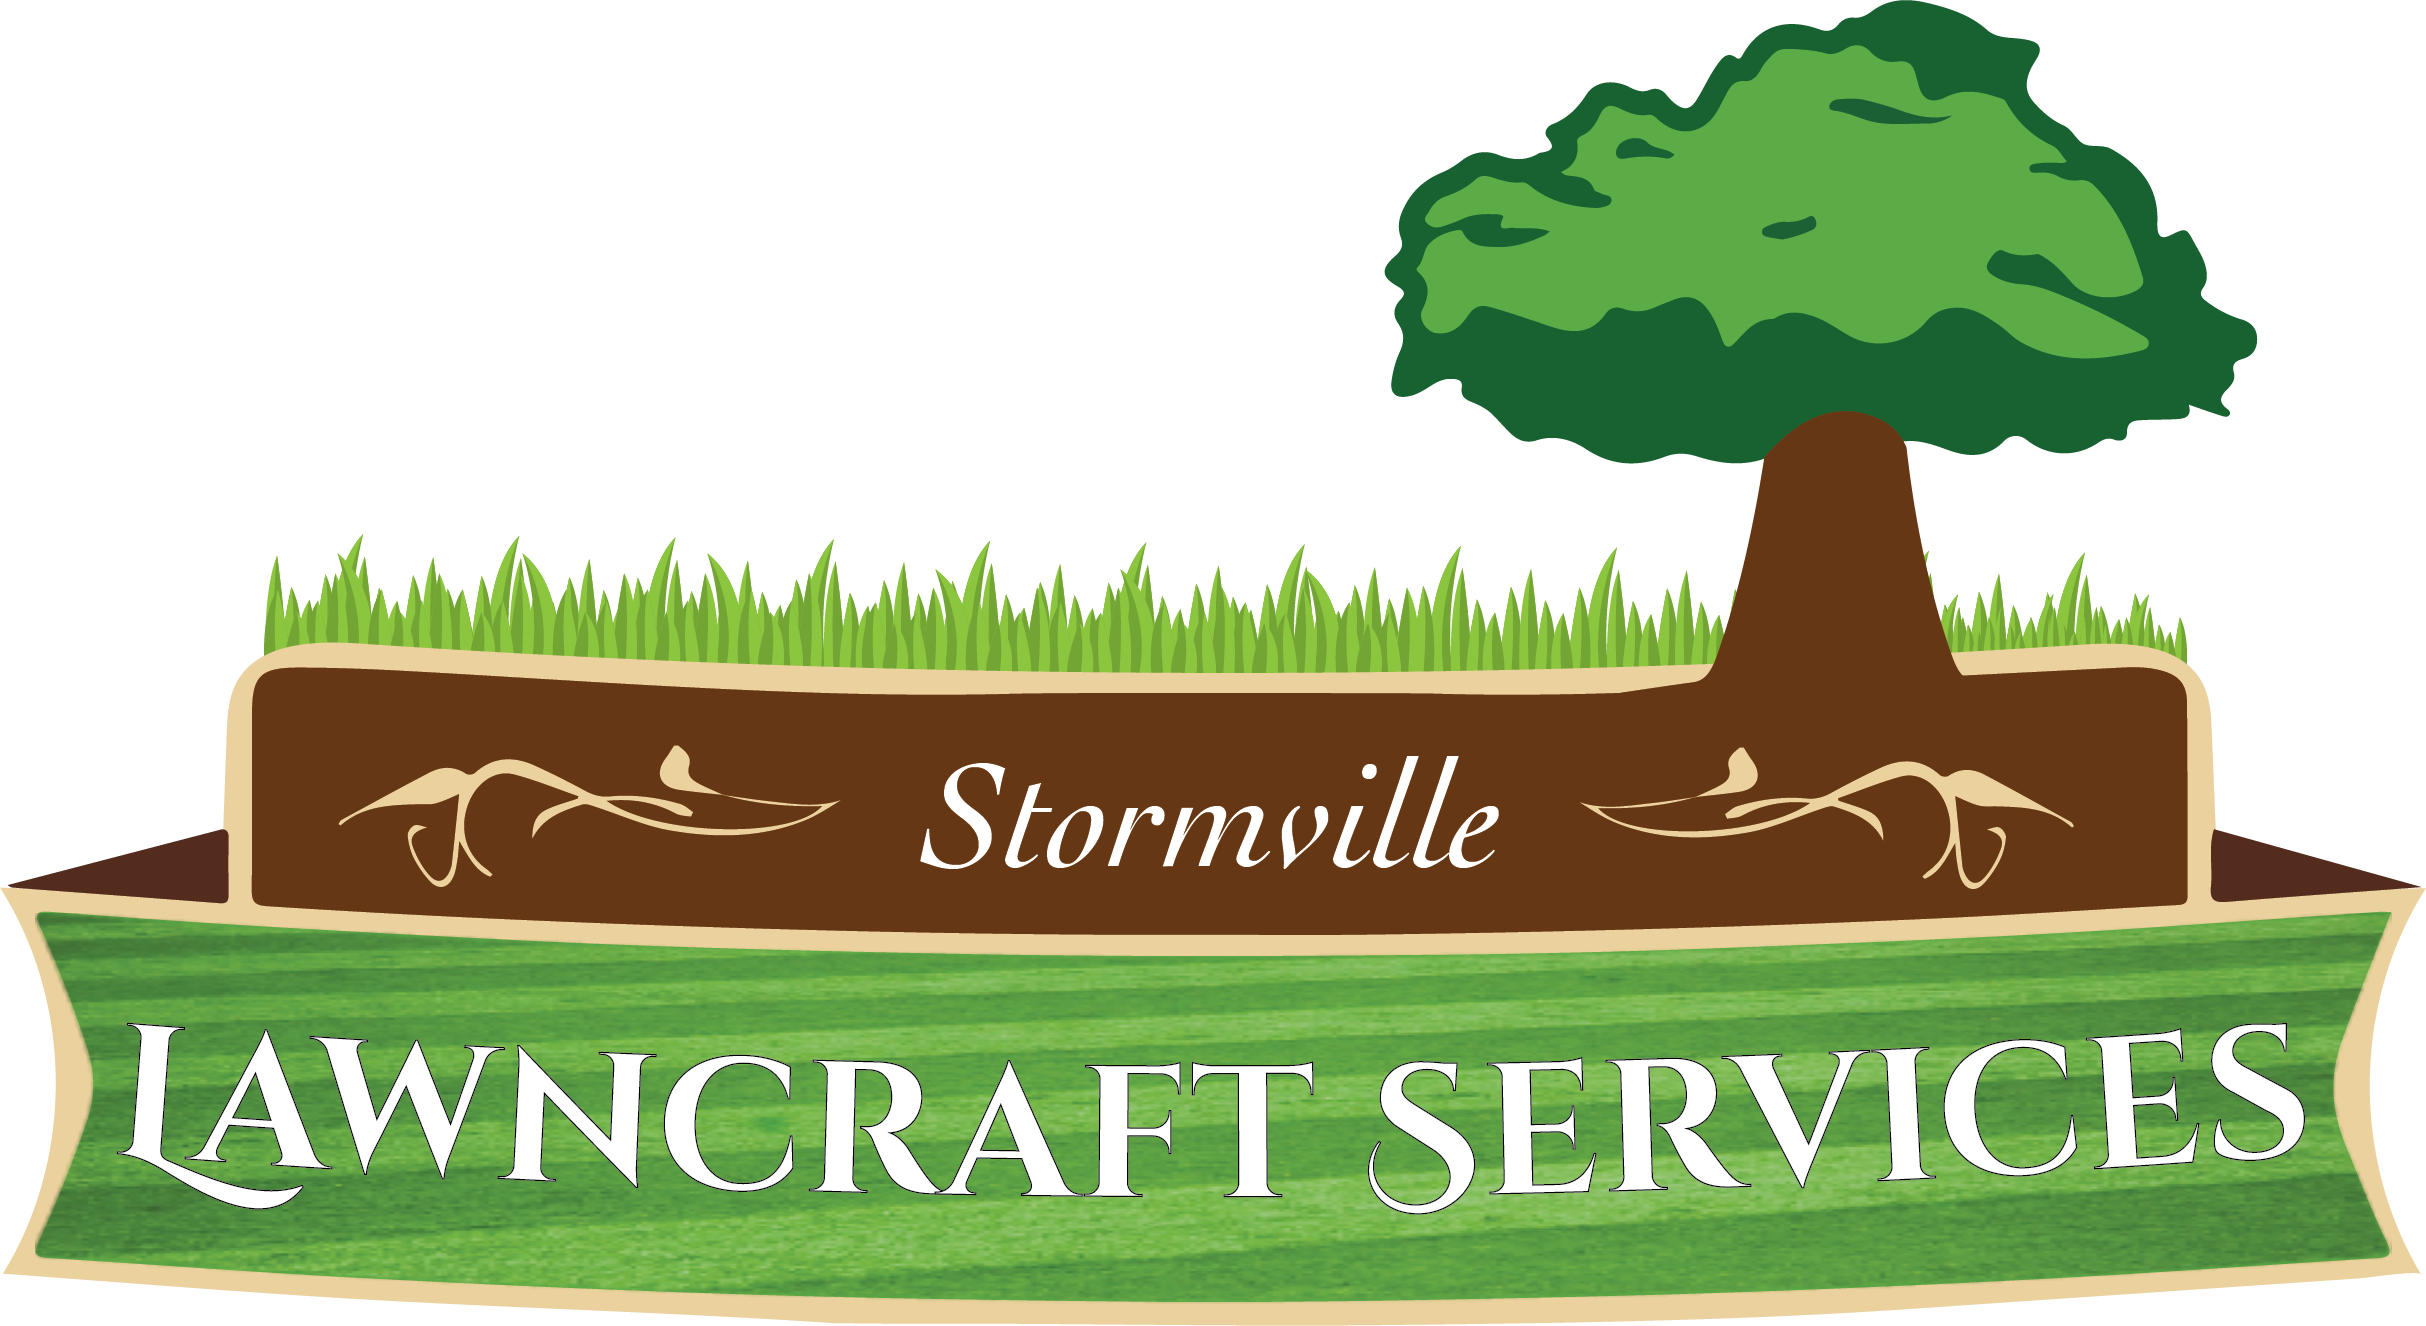 Stormville Lawncraft Services